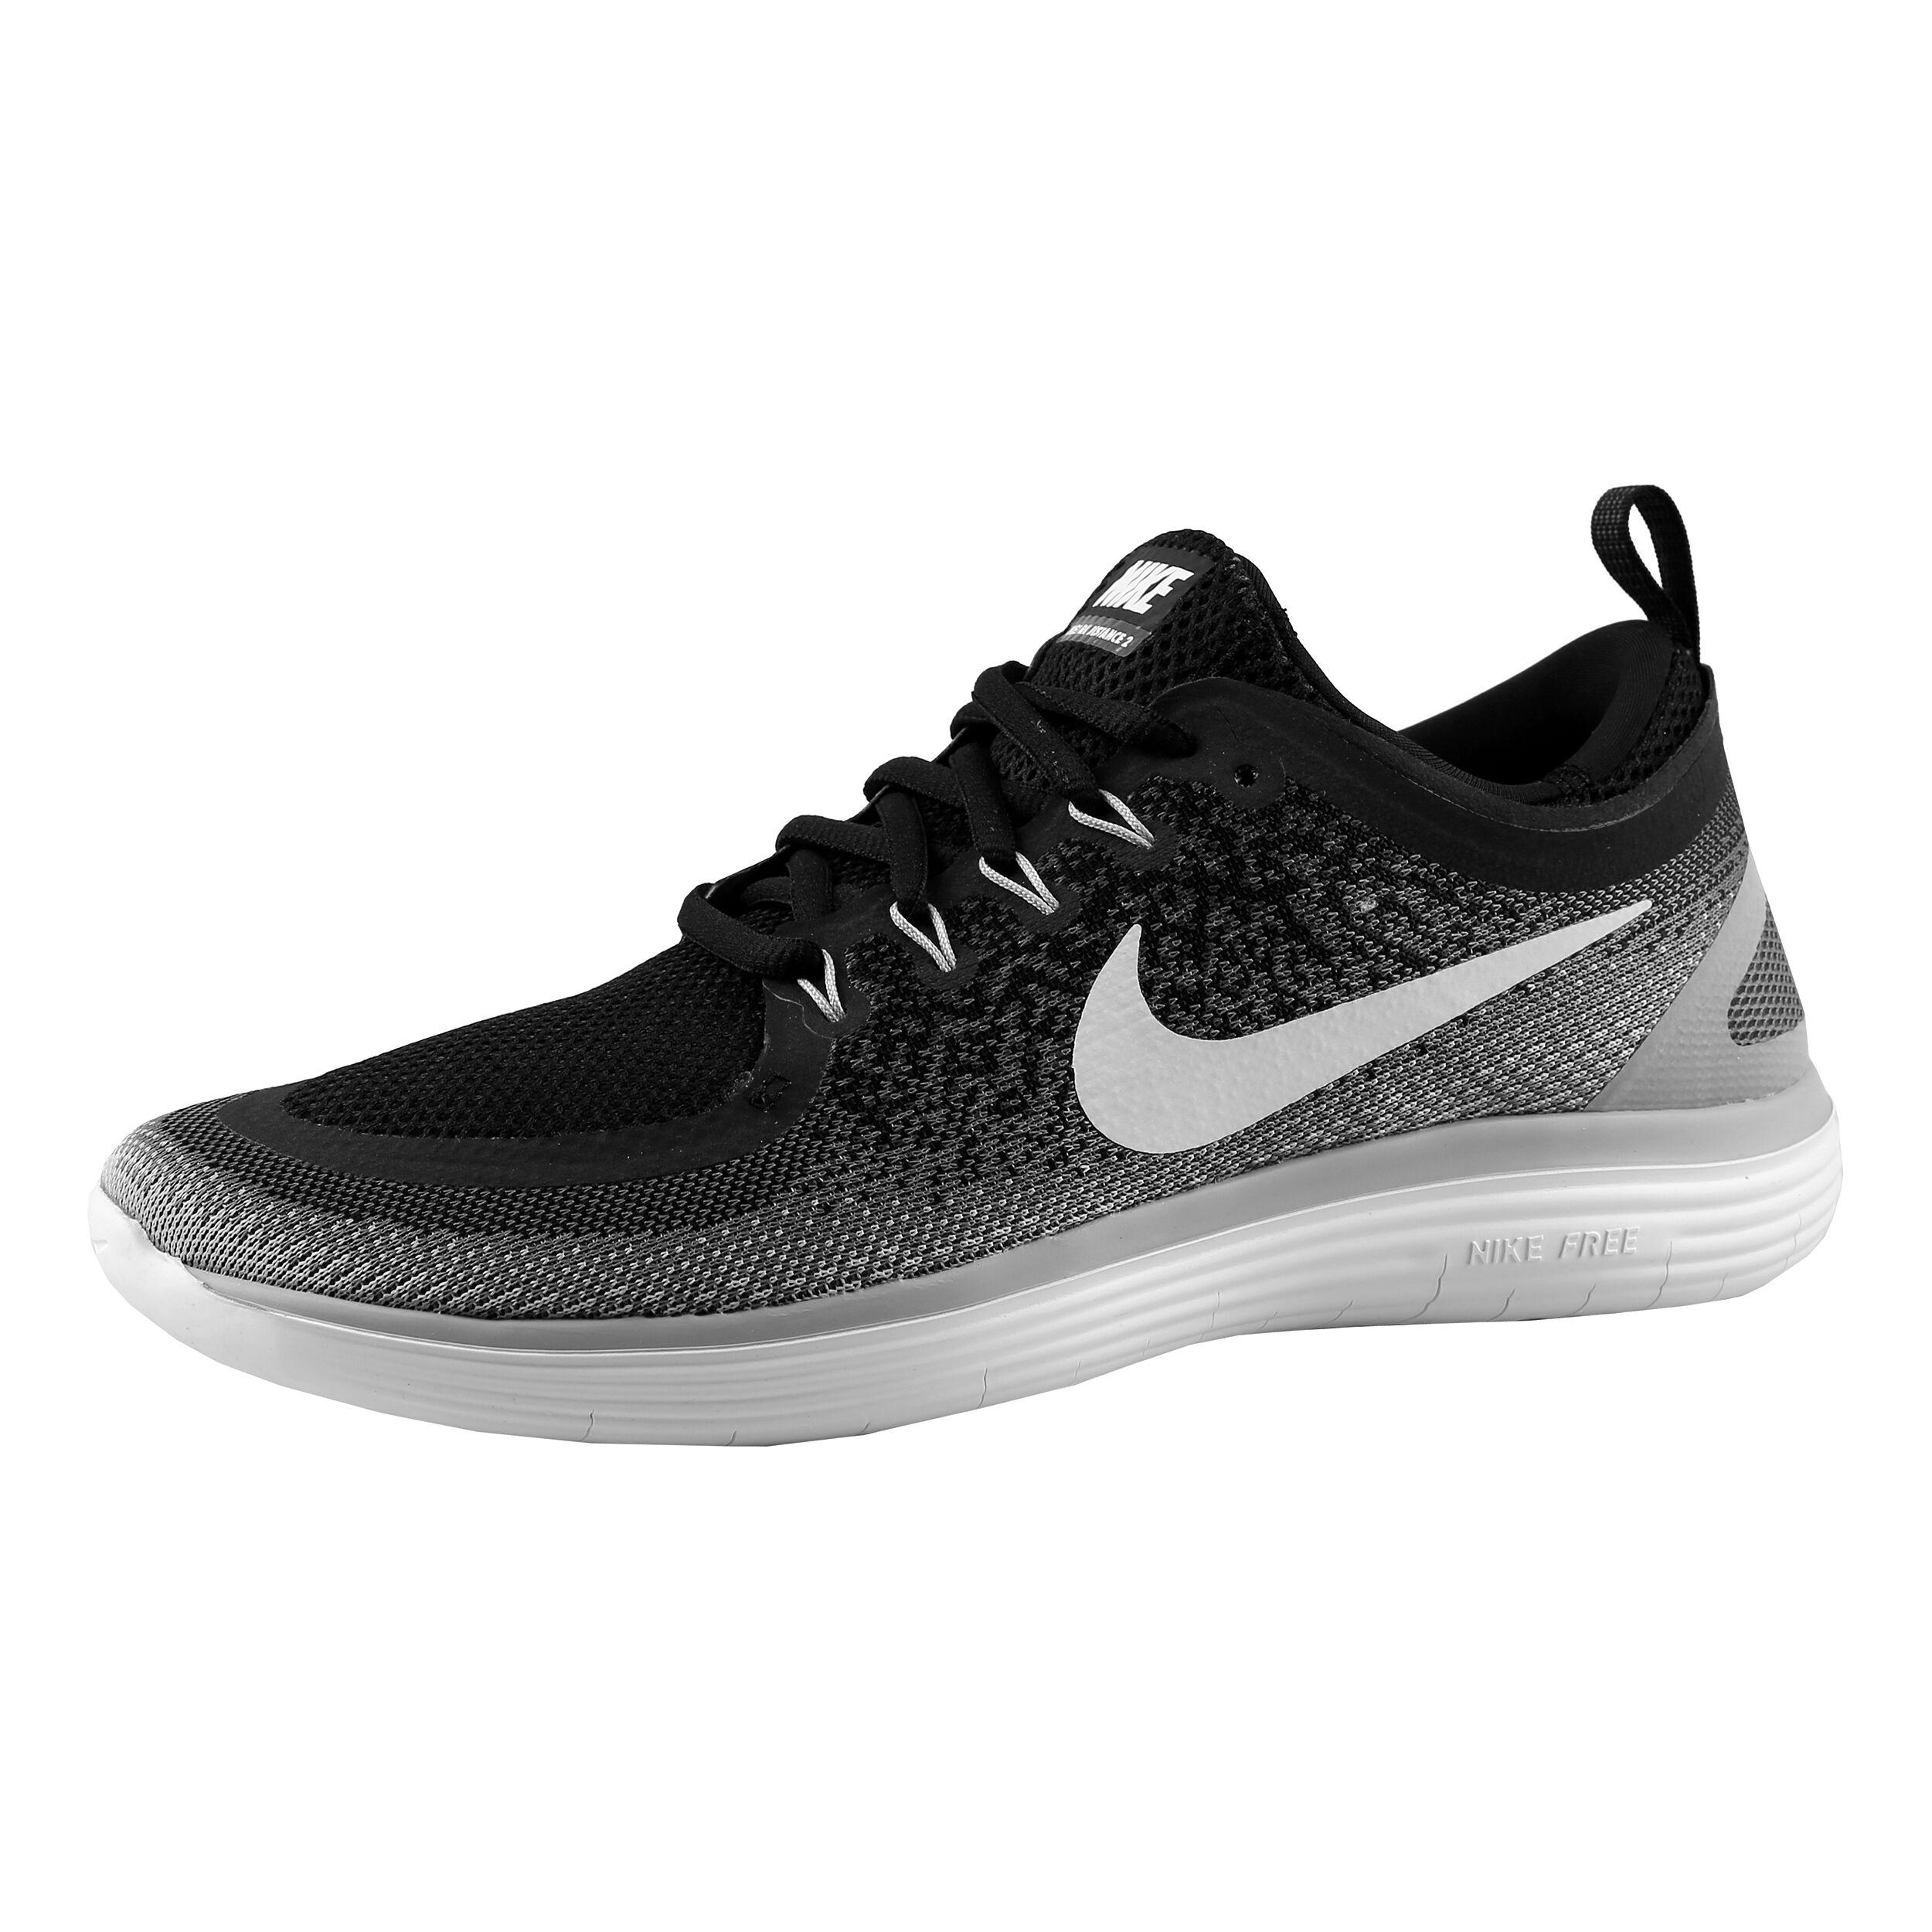 sports shoes 1e2cd 4565b ... greece nike free rn distance 2 women eaba4 33f4d